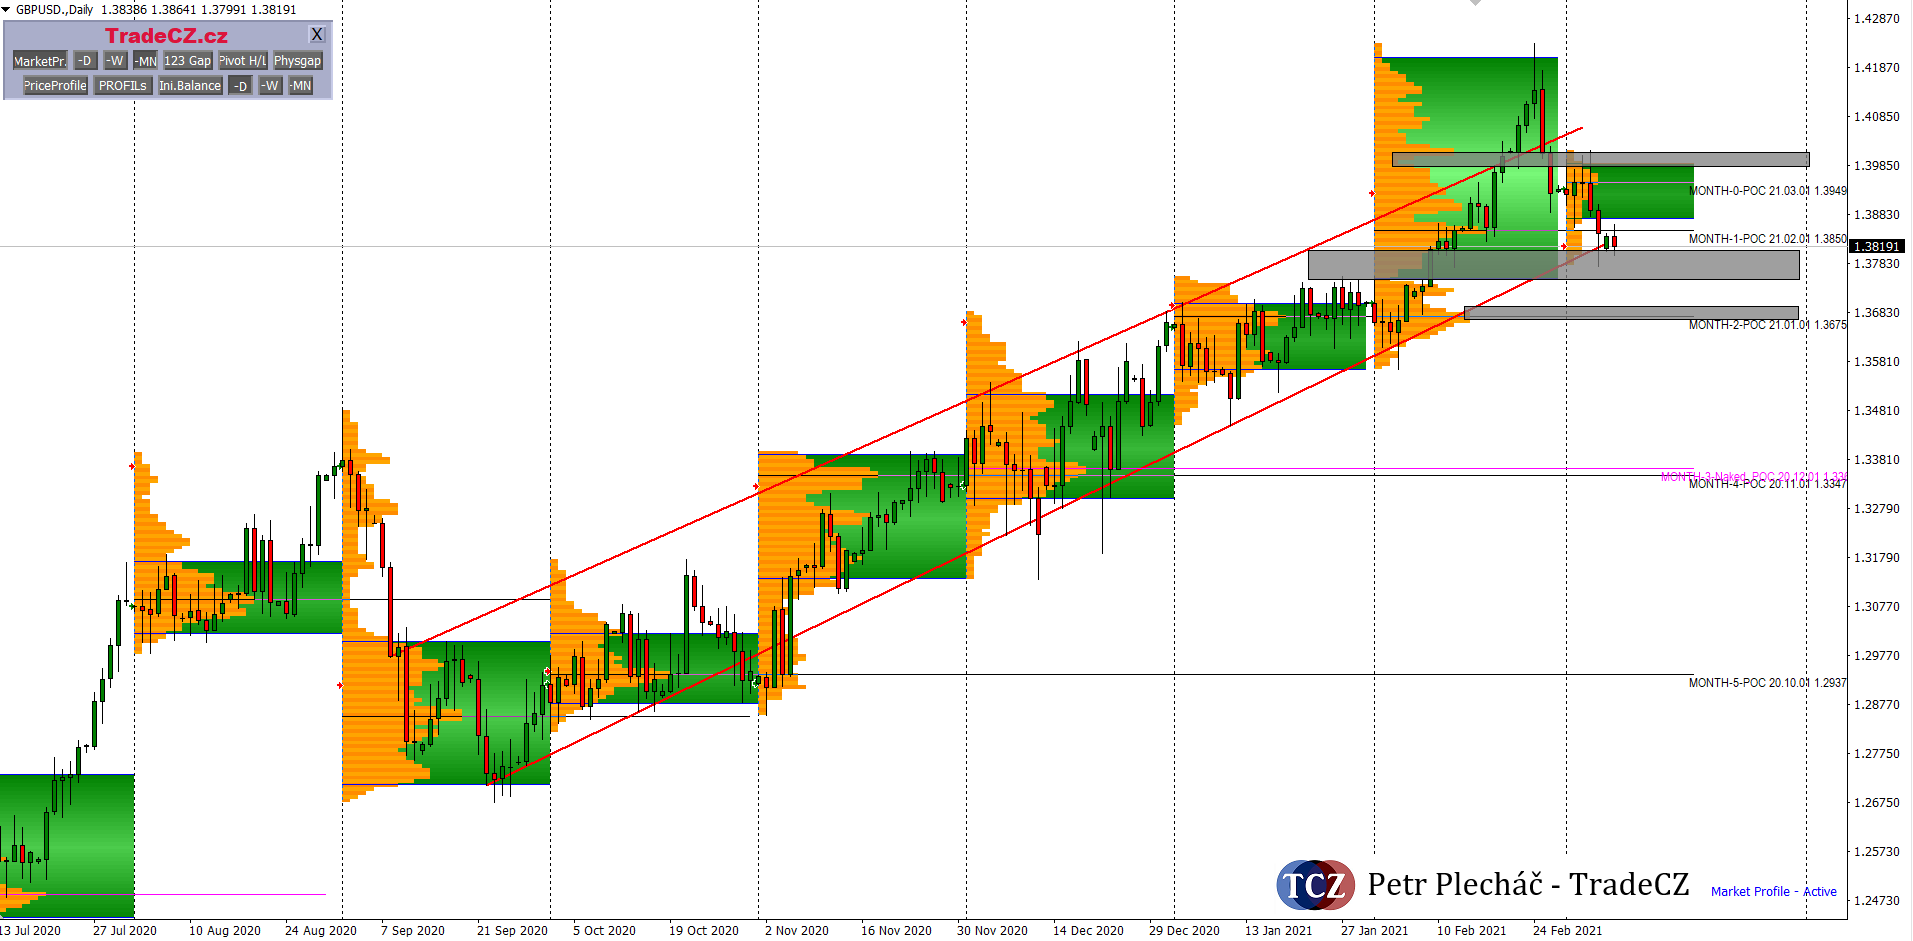 GBPUSD forex market profile